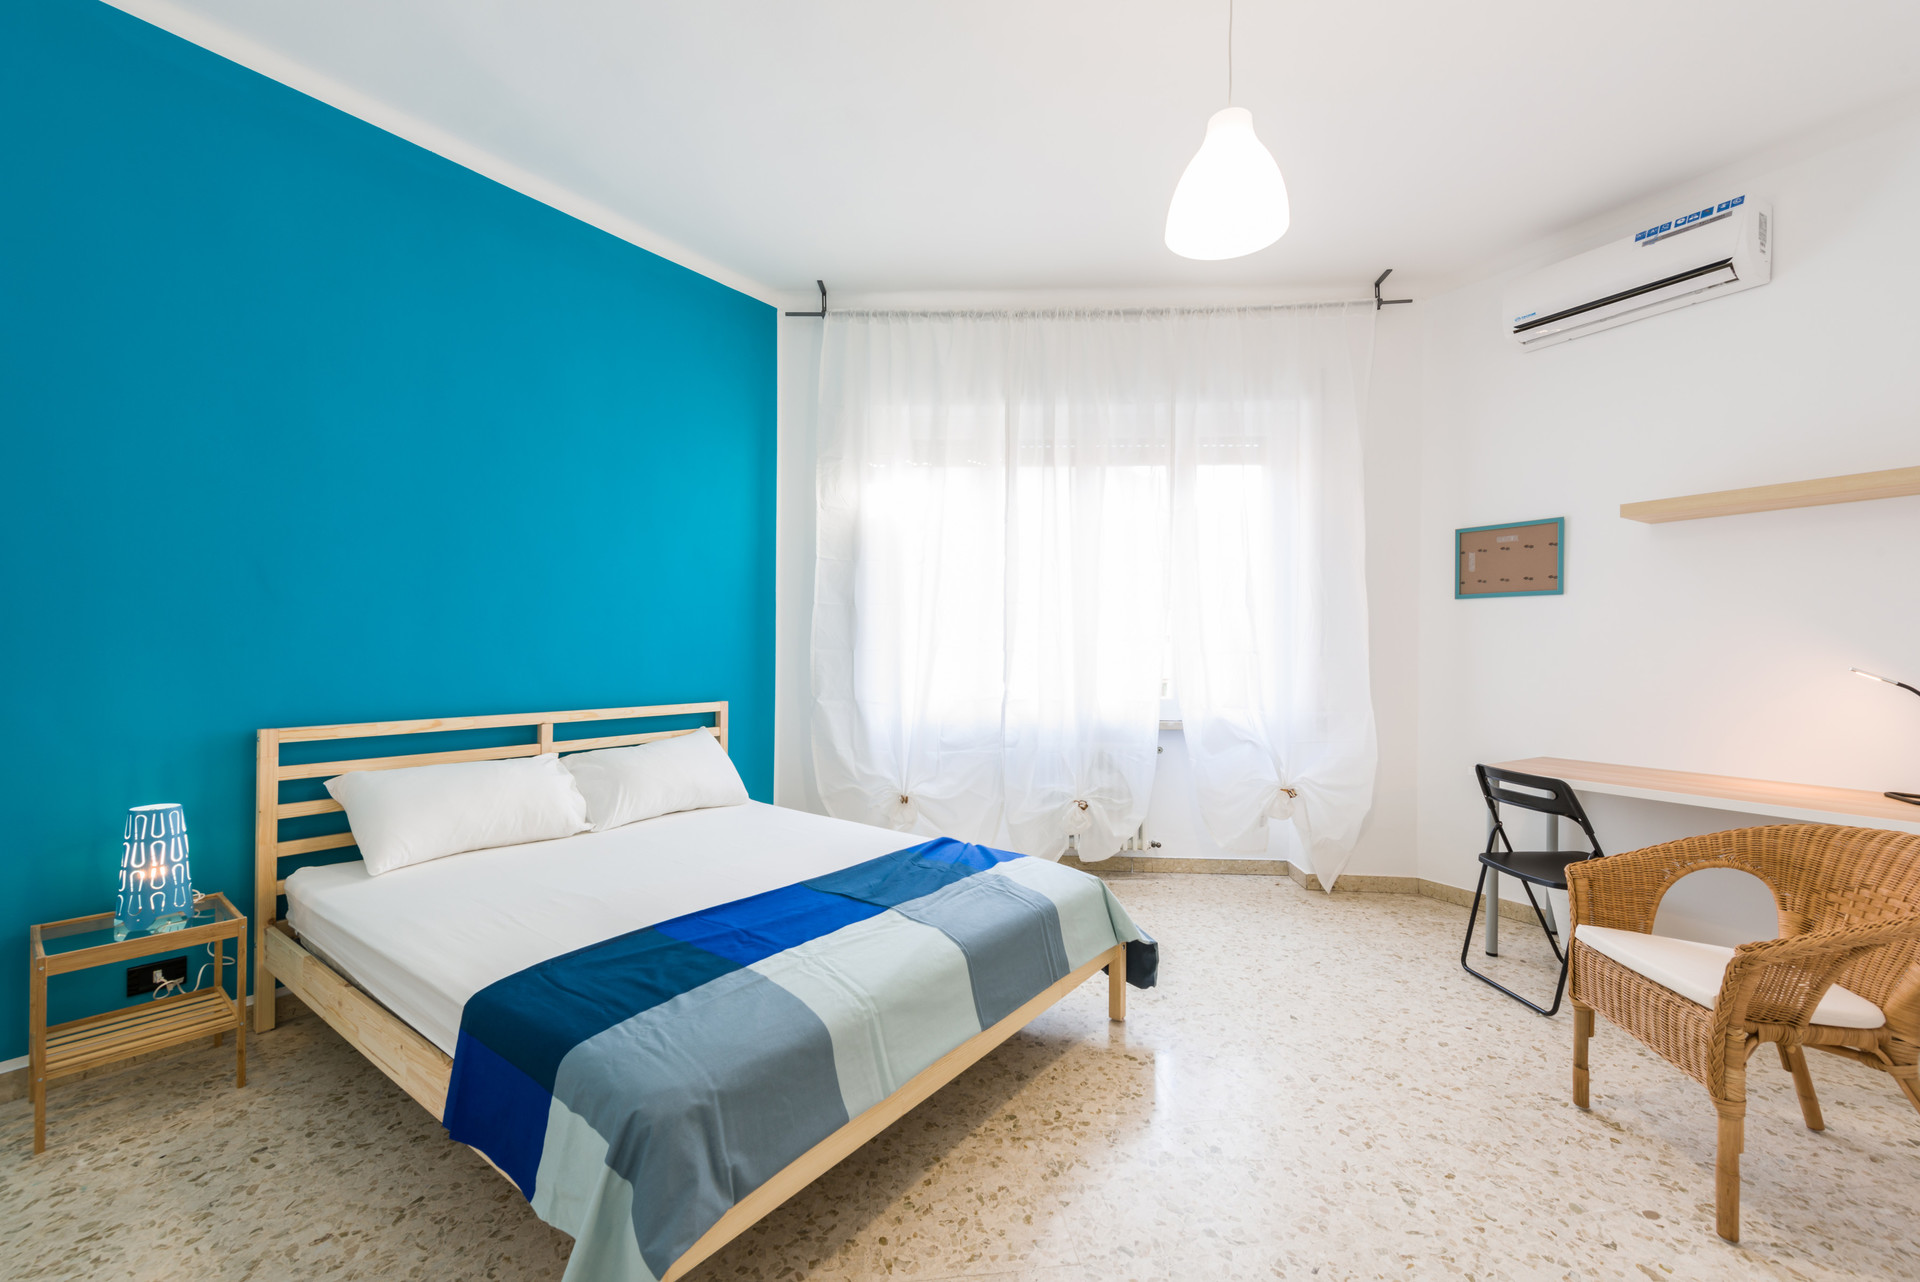 bari bedroom furniture. Spacious And Confortable Bedroom In Really Nice Luminous Sha Bari Furniture